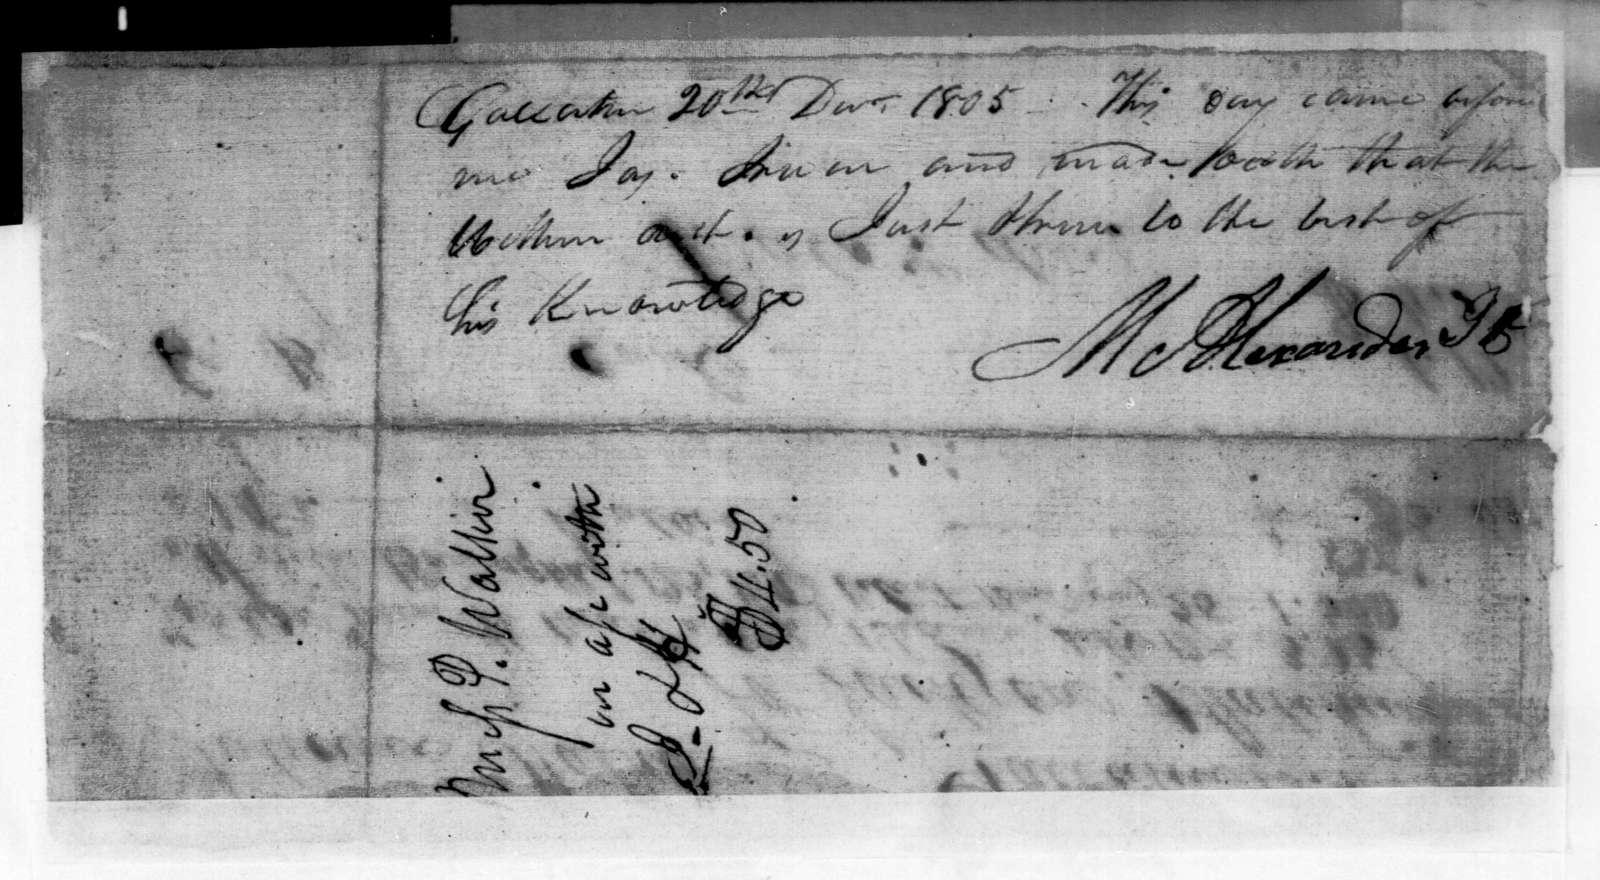 Jackson & Hutchings to Patience Walker, August 23, 1803